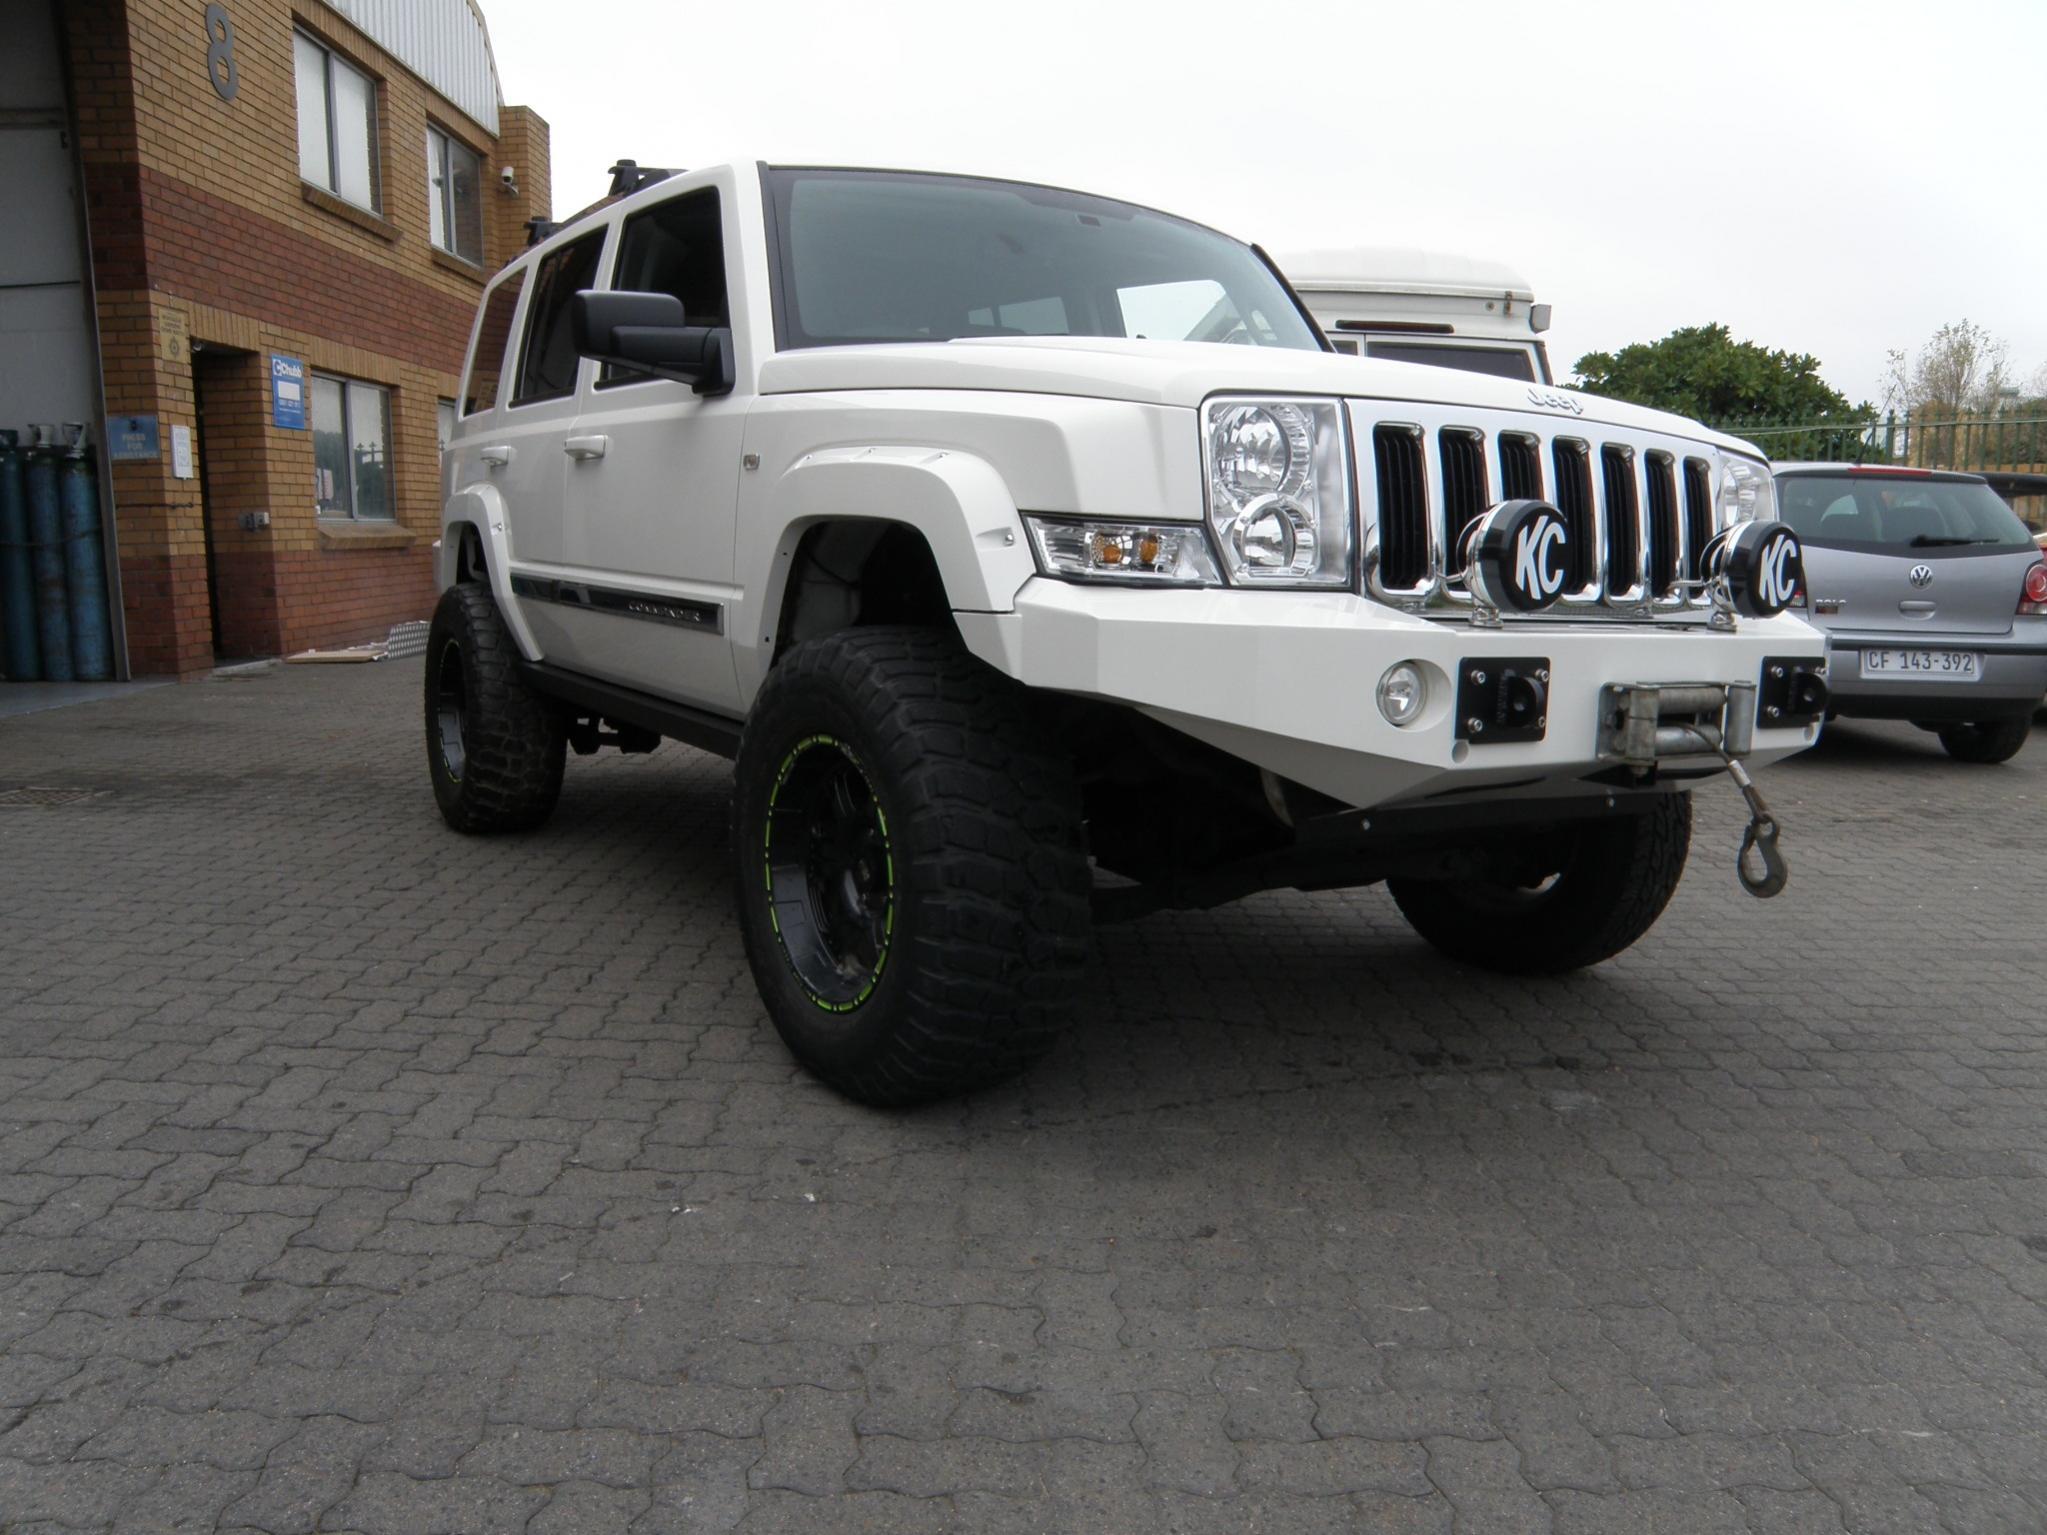 08 commander lifted! - jeep commander forums: jeep commander forum